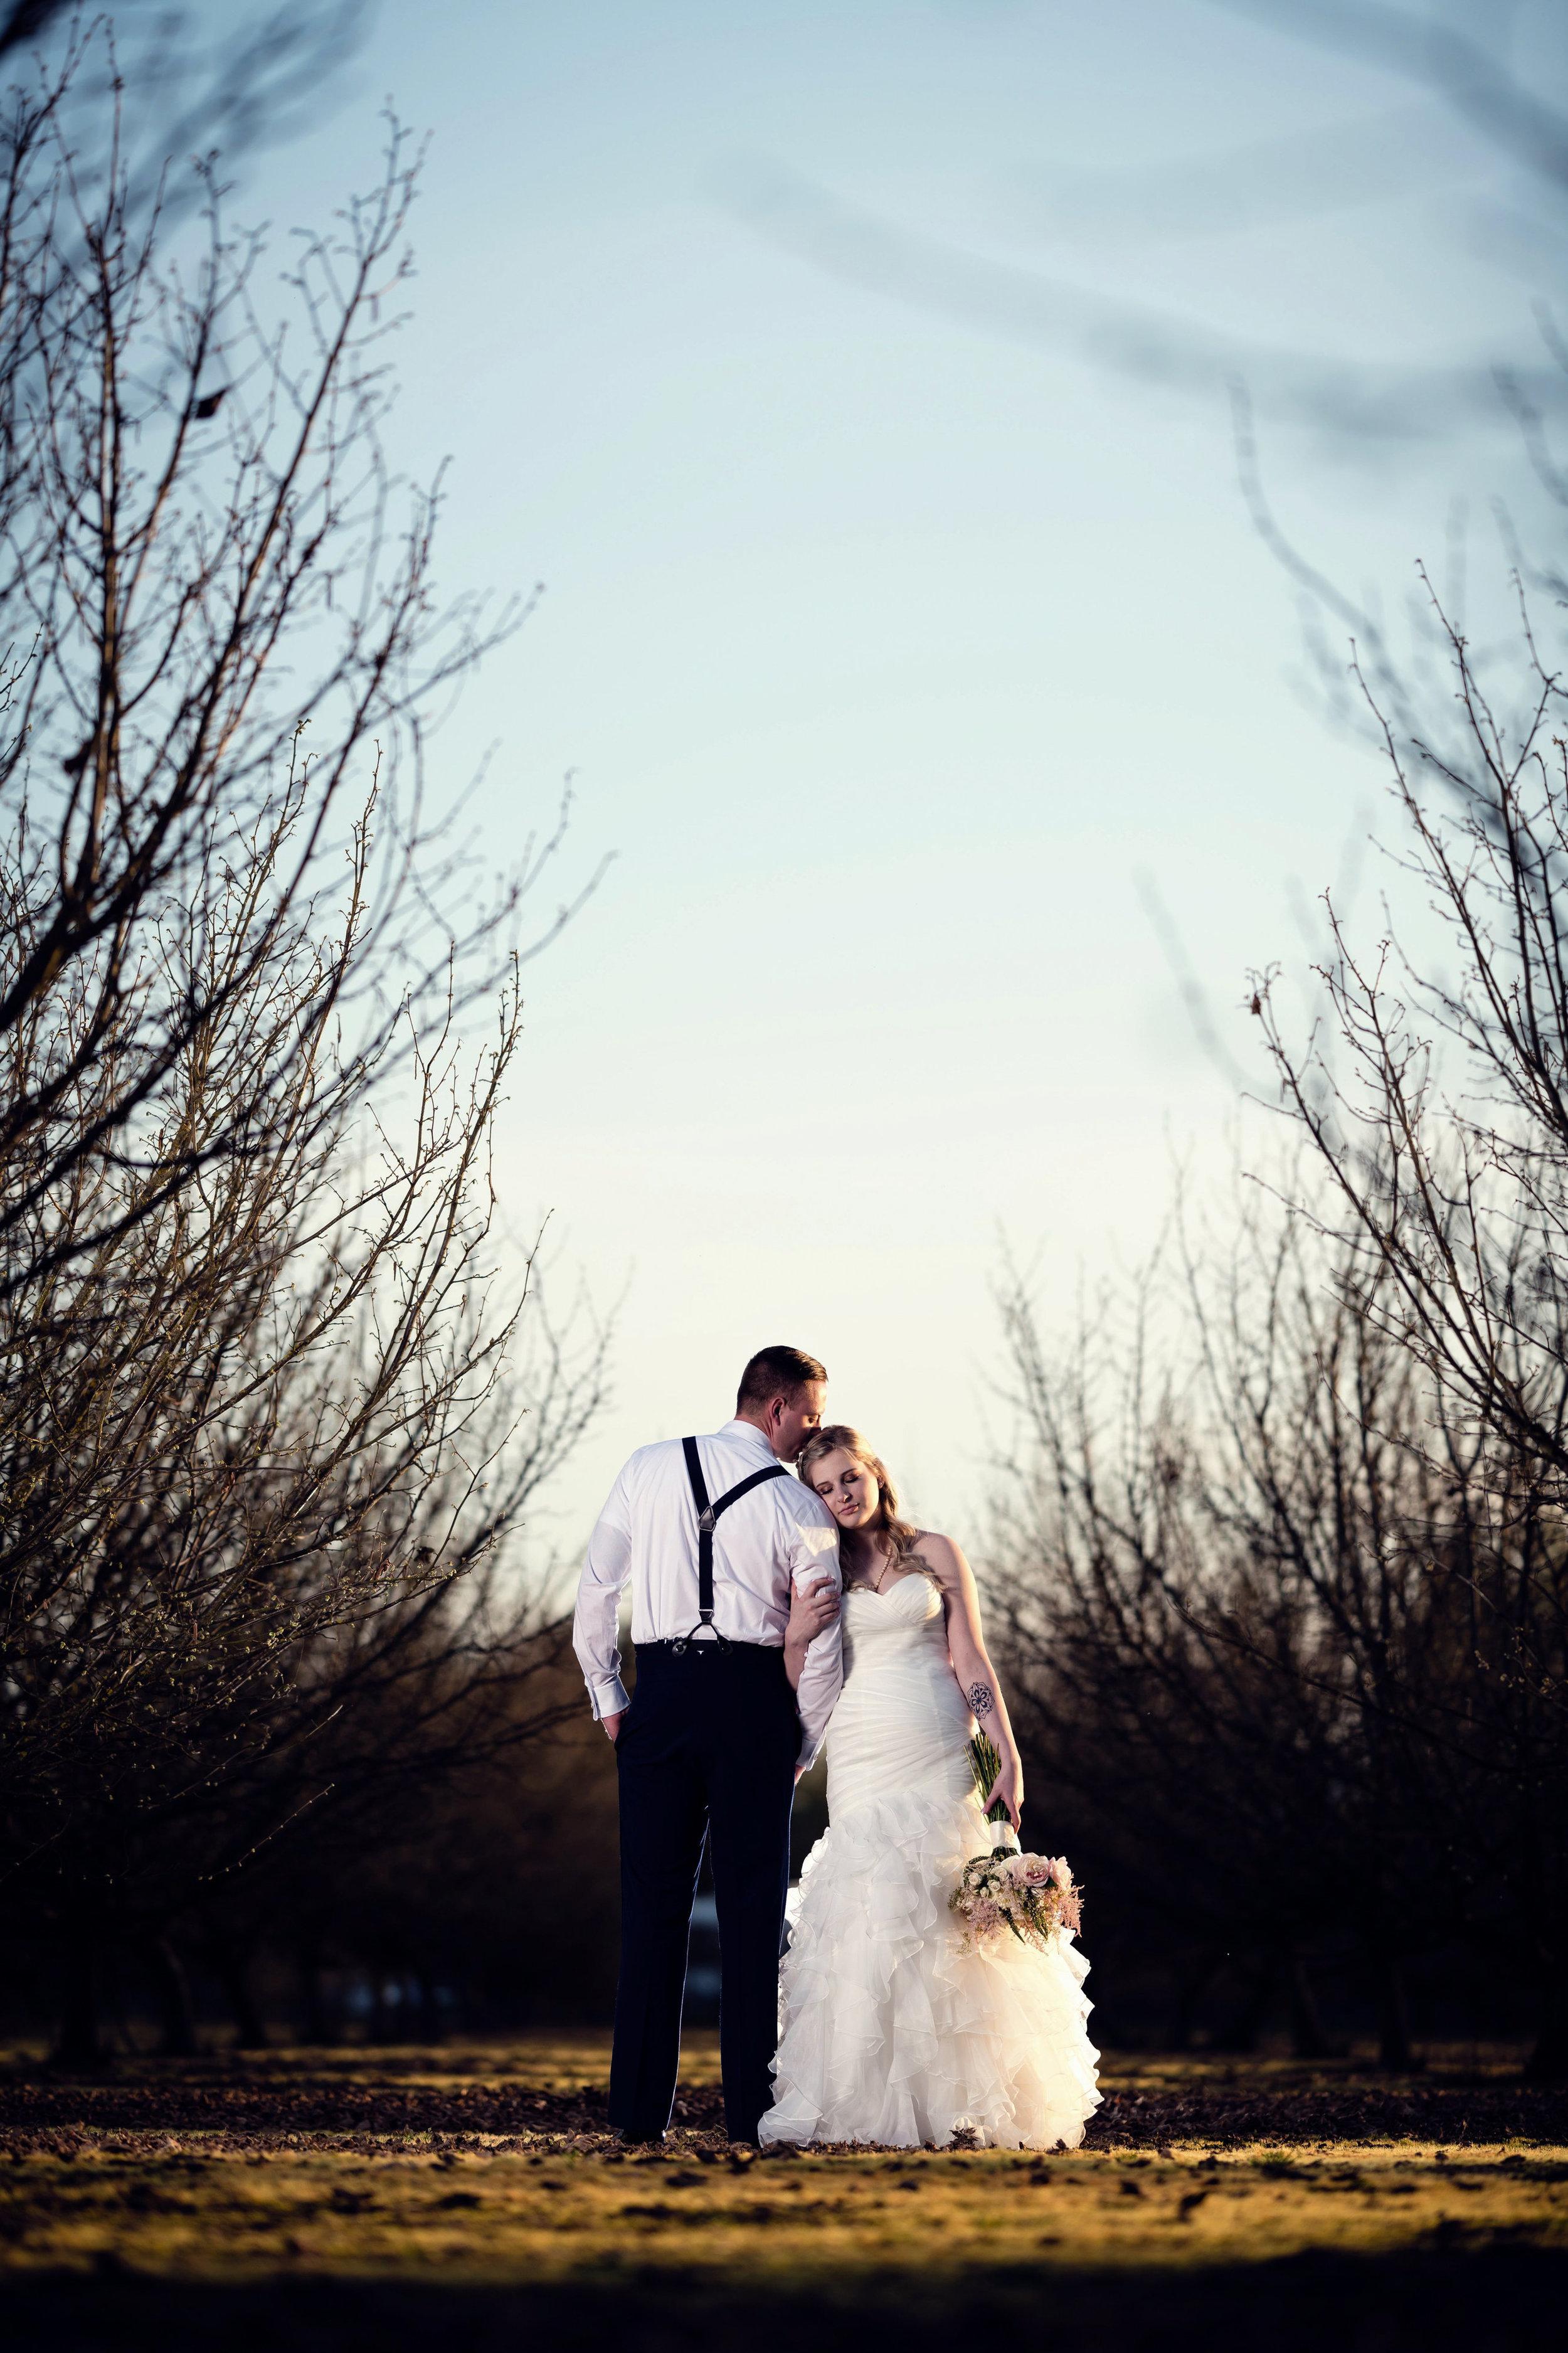 Benjamin Wedding-Photos 2-0132.jpg